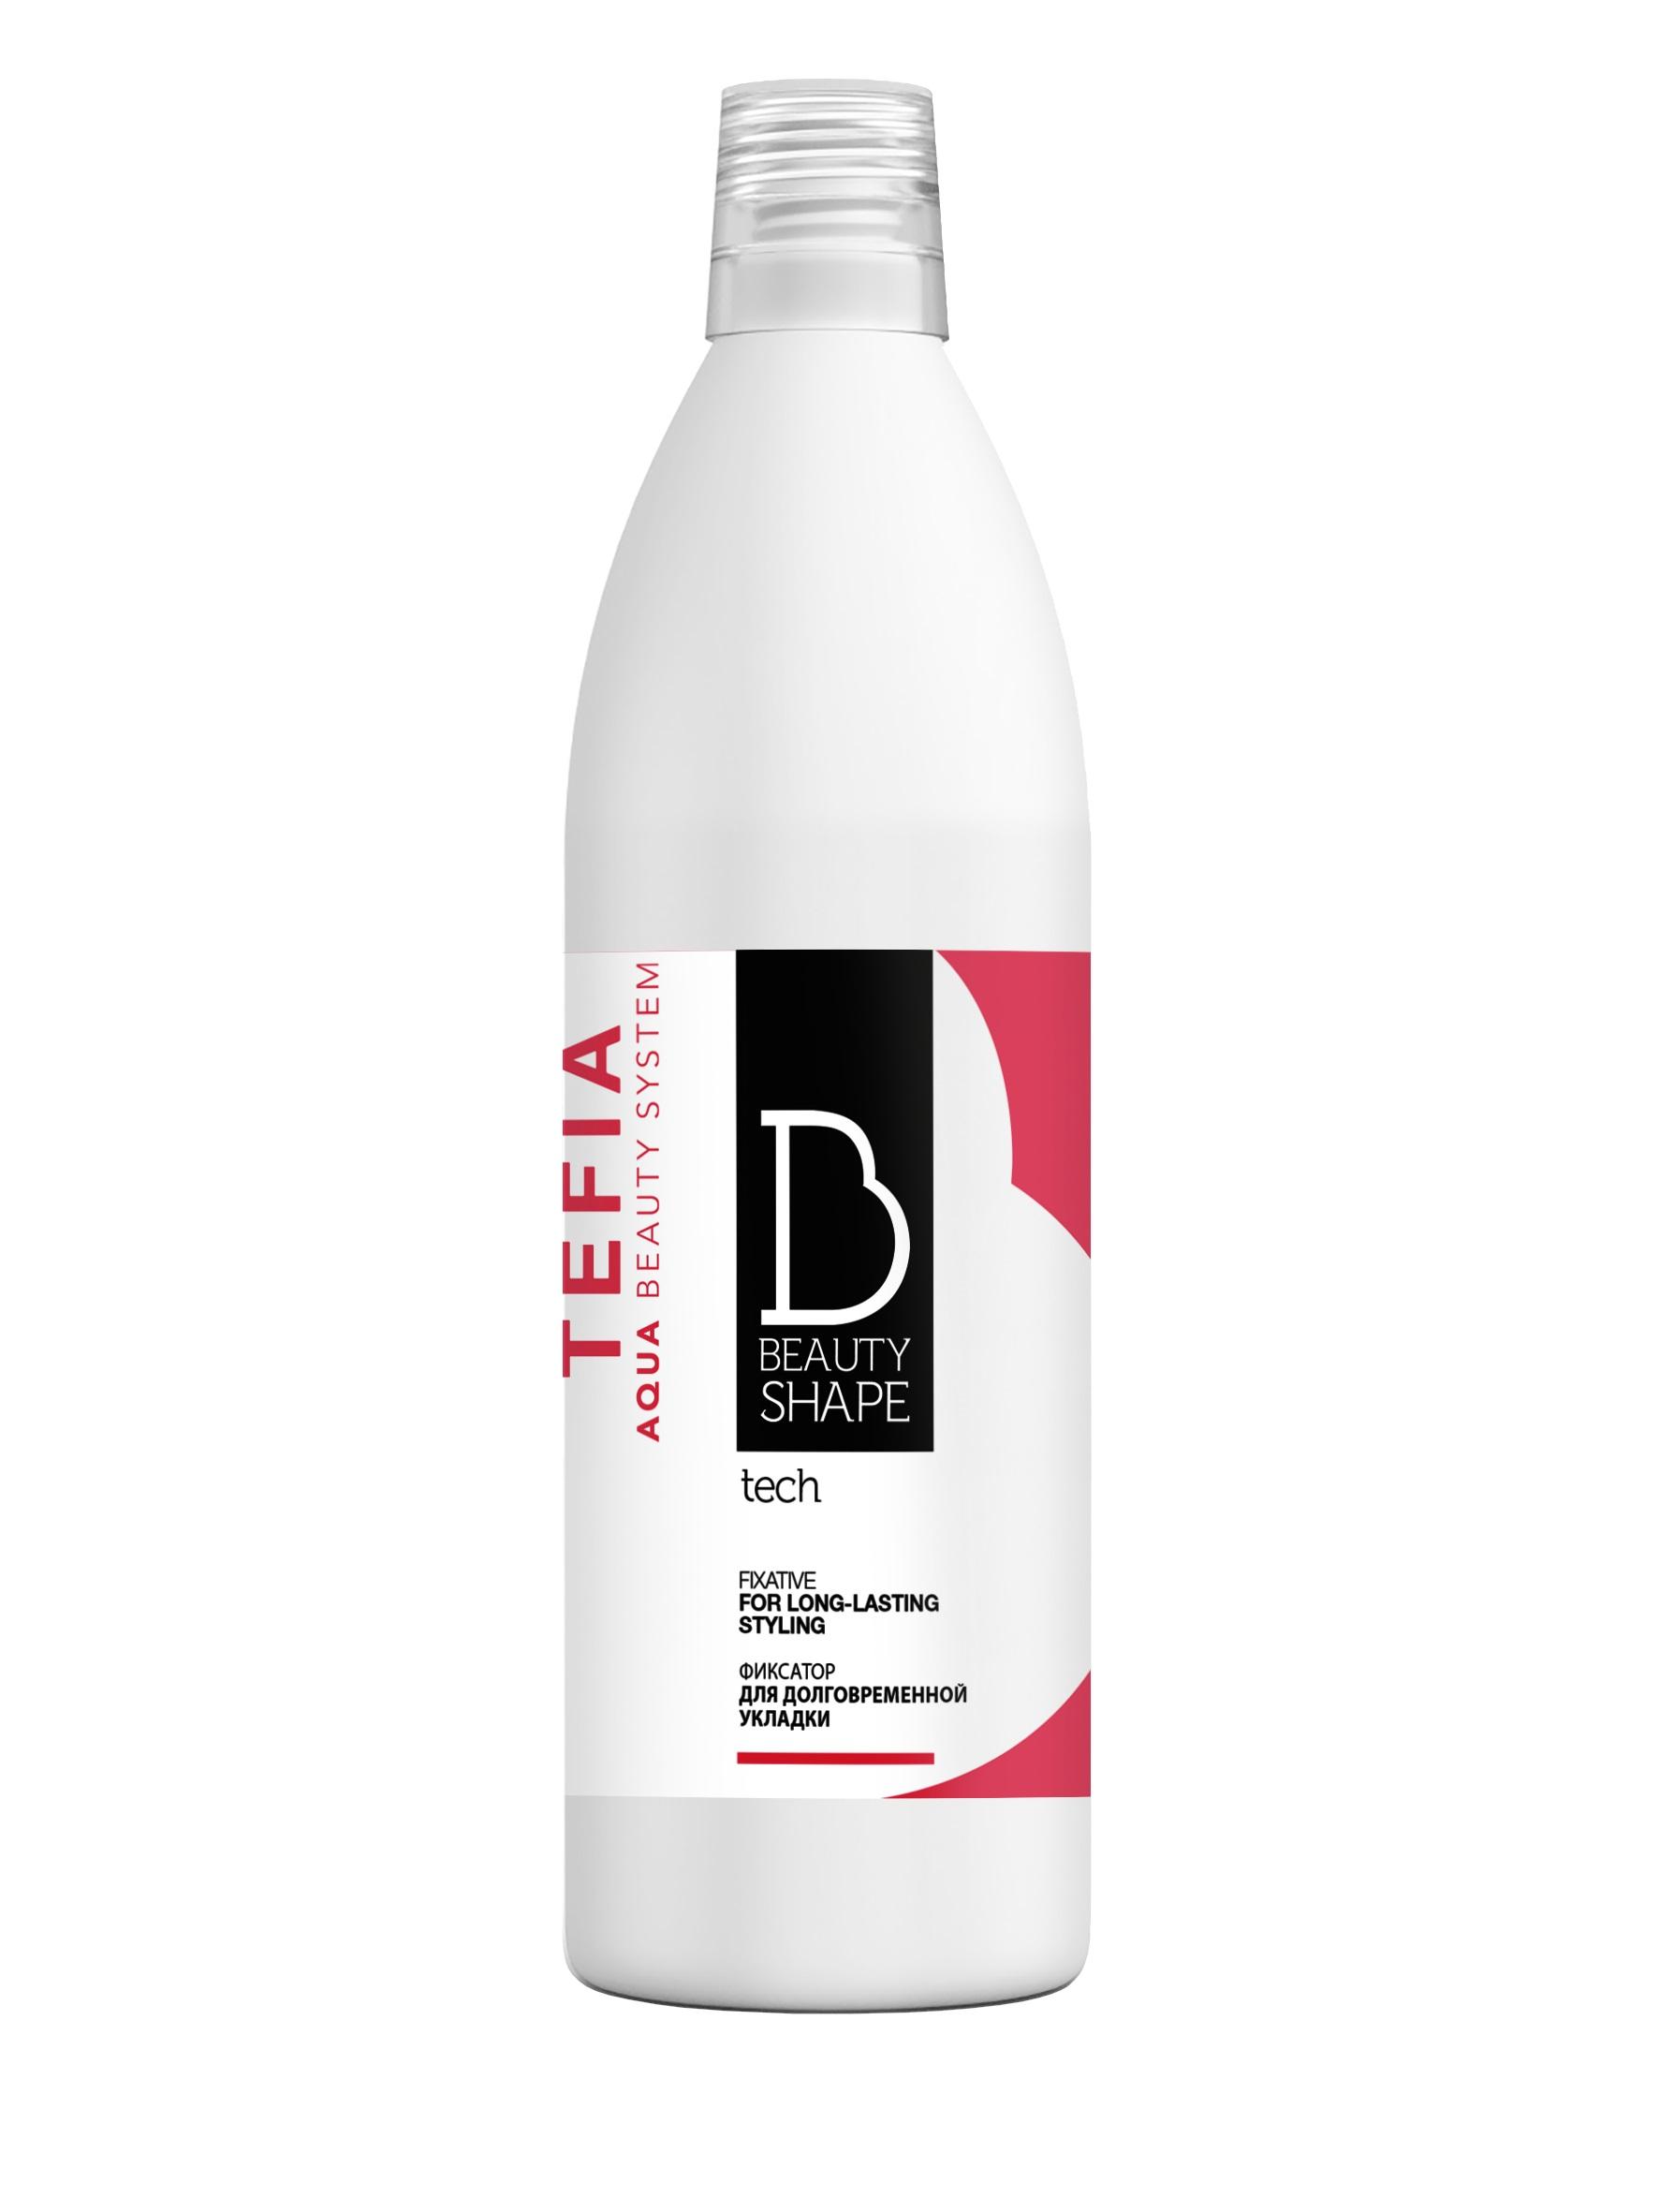 TEFIA Фиксатор для долговременной укладки / Beauty Shape 1000 мл